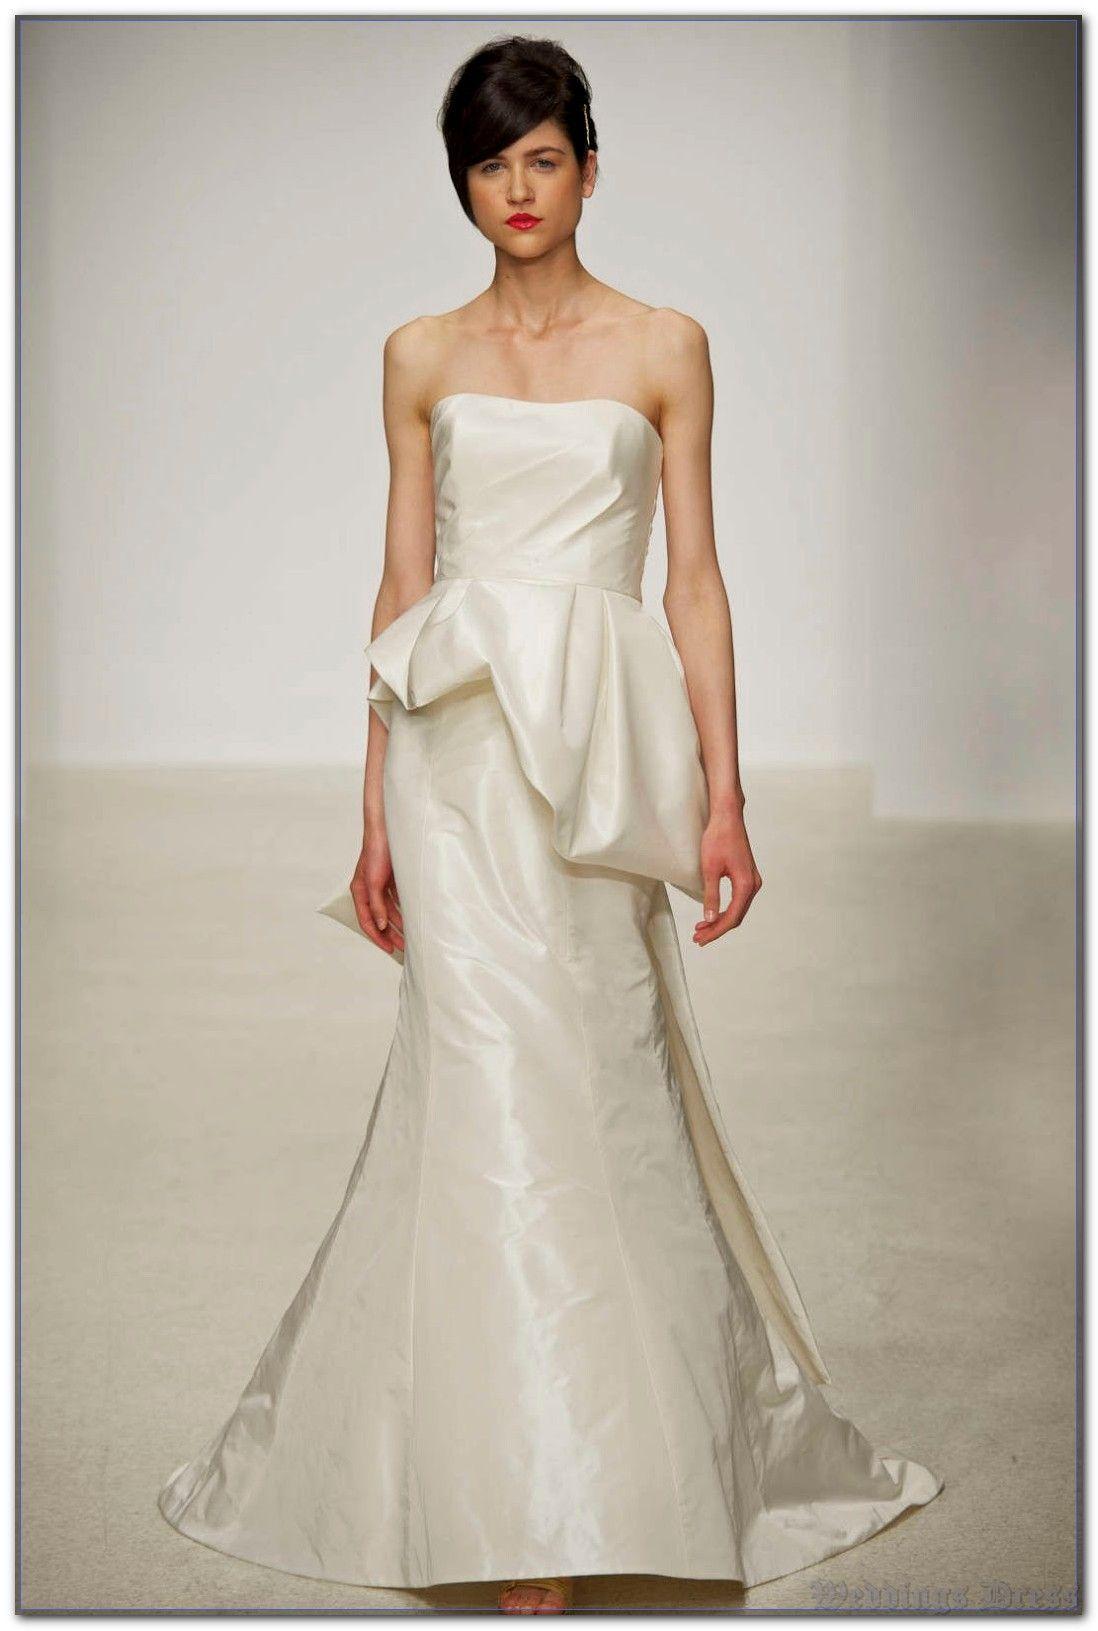 The Weddings Dress Mystery Revealed